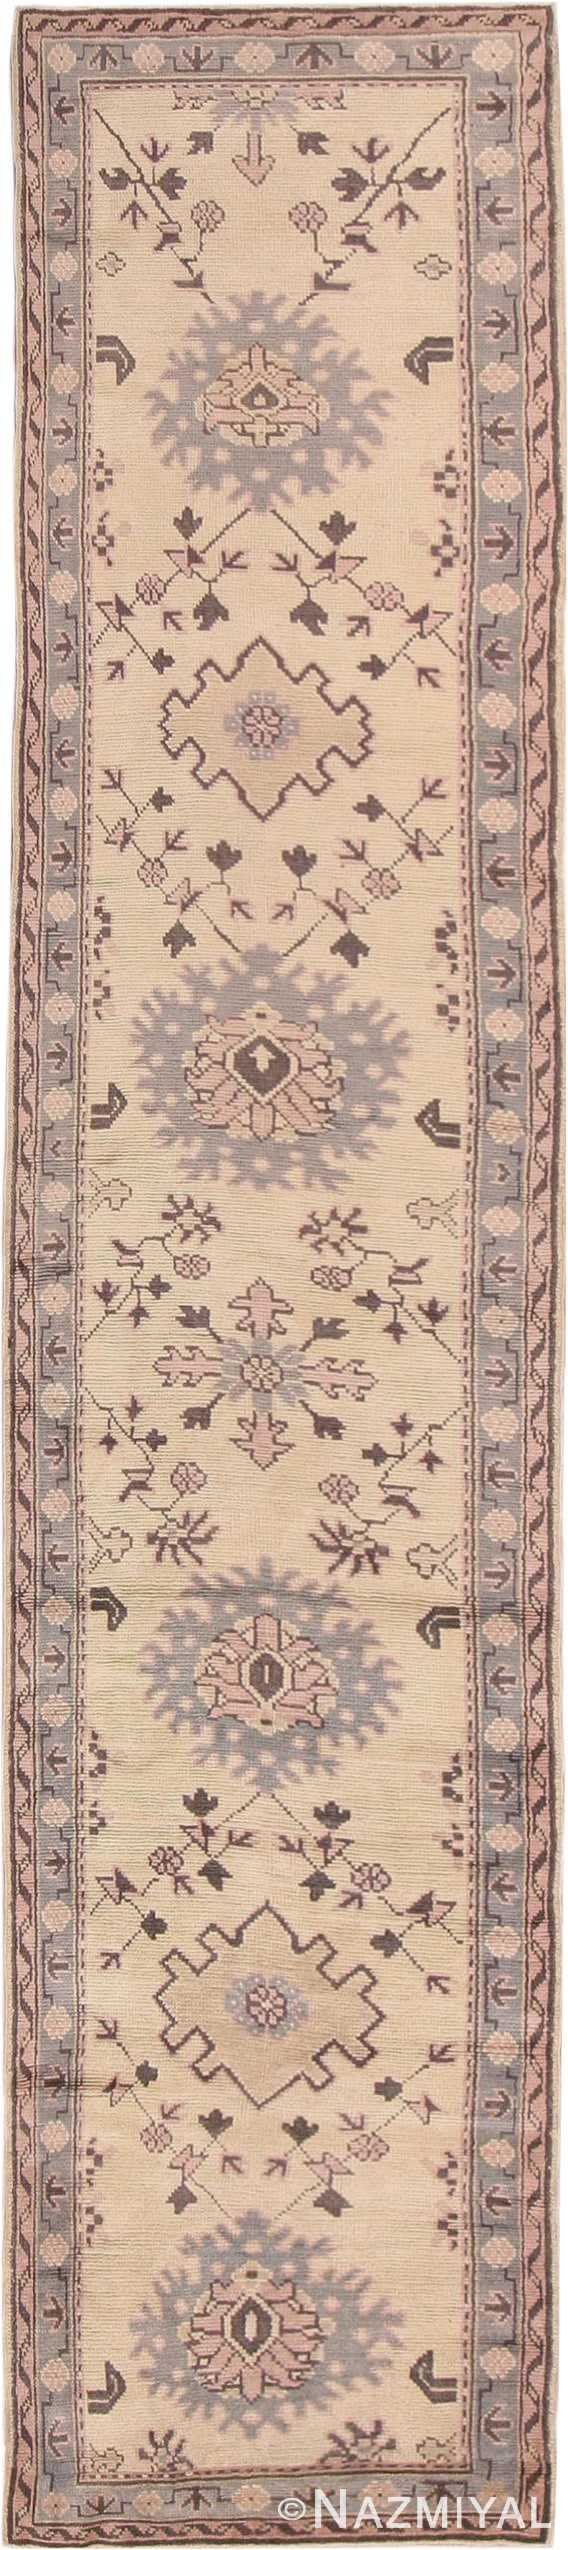 Decorative Antique Turkish Oushak Runner Rug #41776 by Nazmiyal Antique Rugs